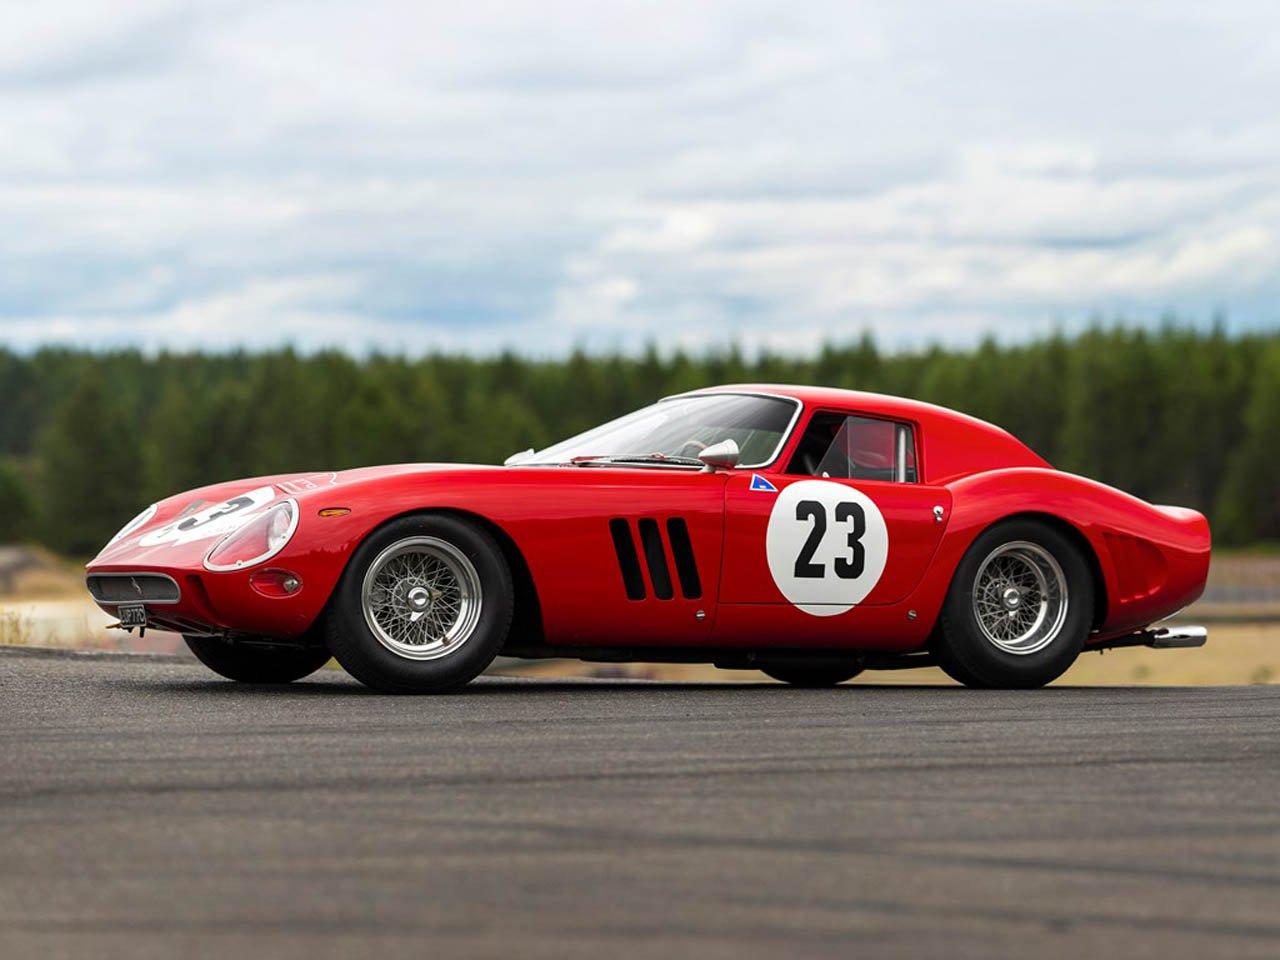 1962 Ferrari 250 GTO-Monterey-auction-2